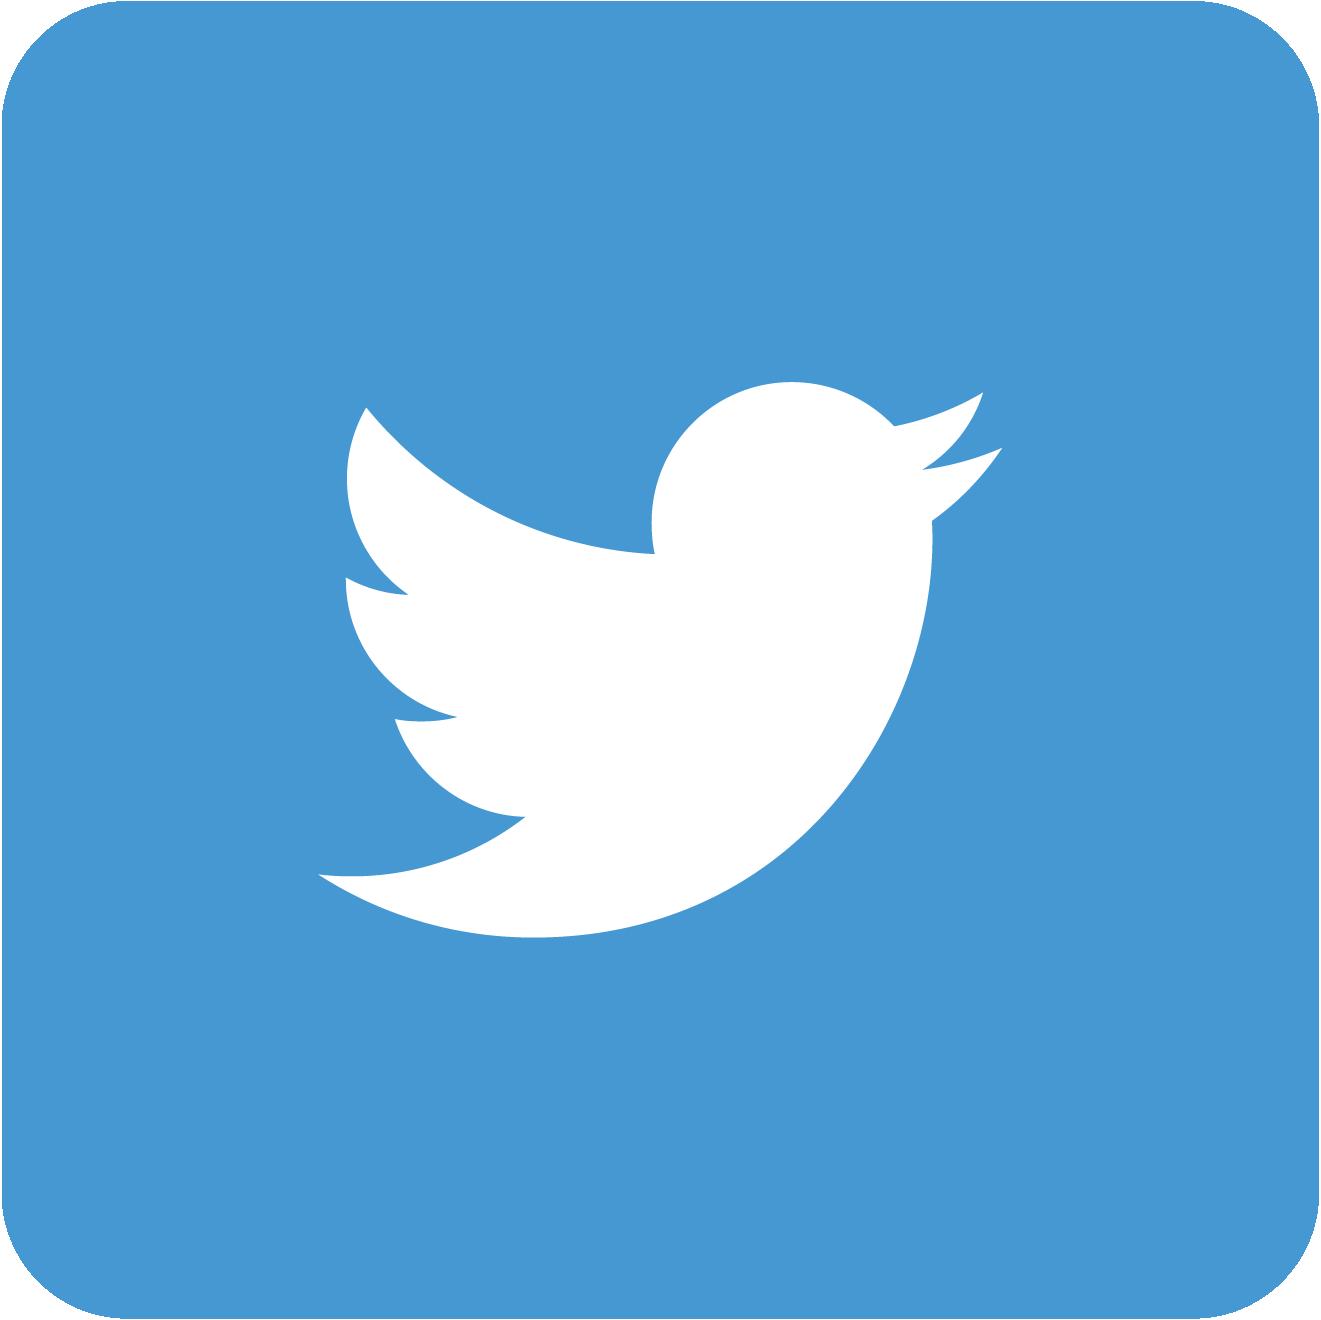 Twitter MonClubSportif